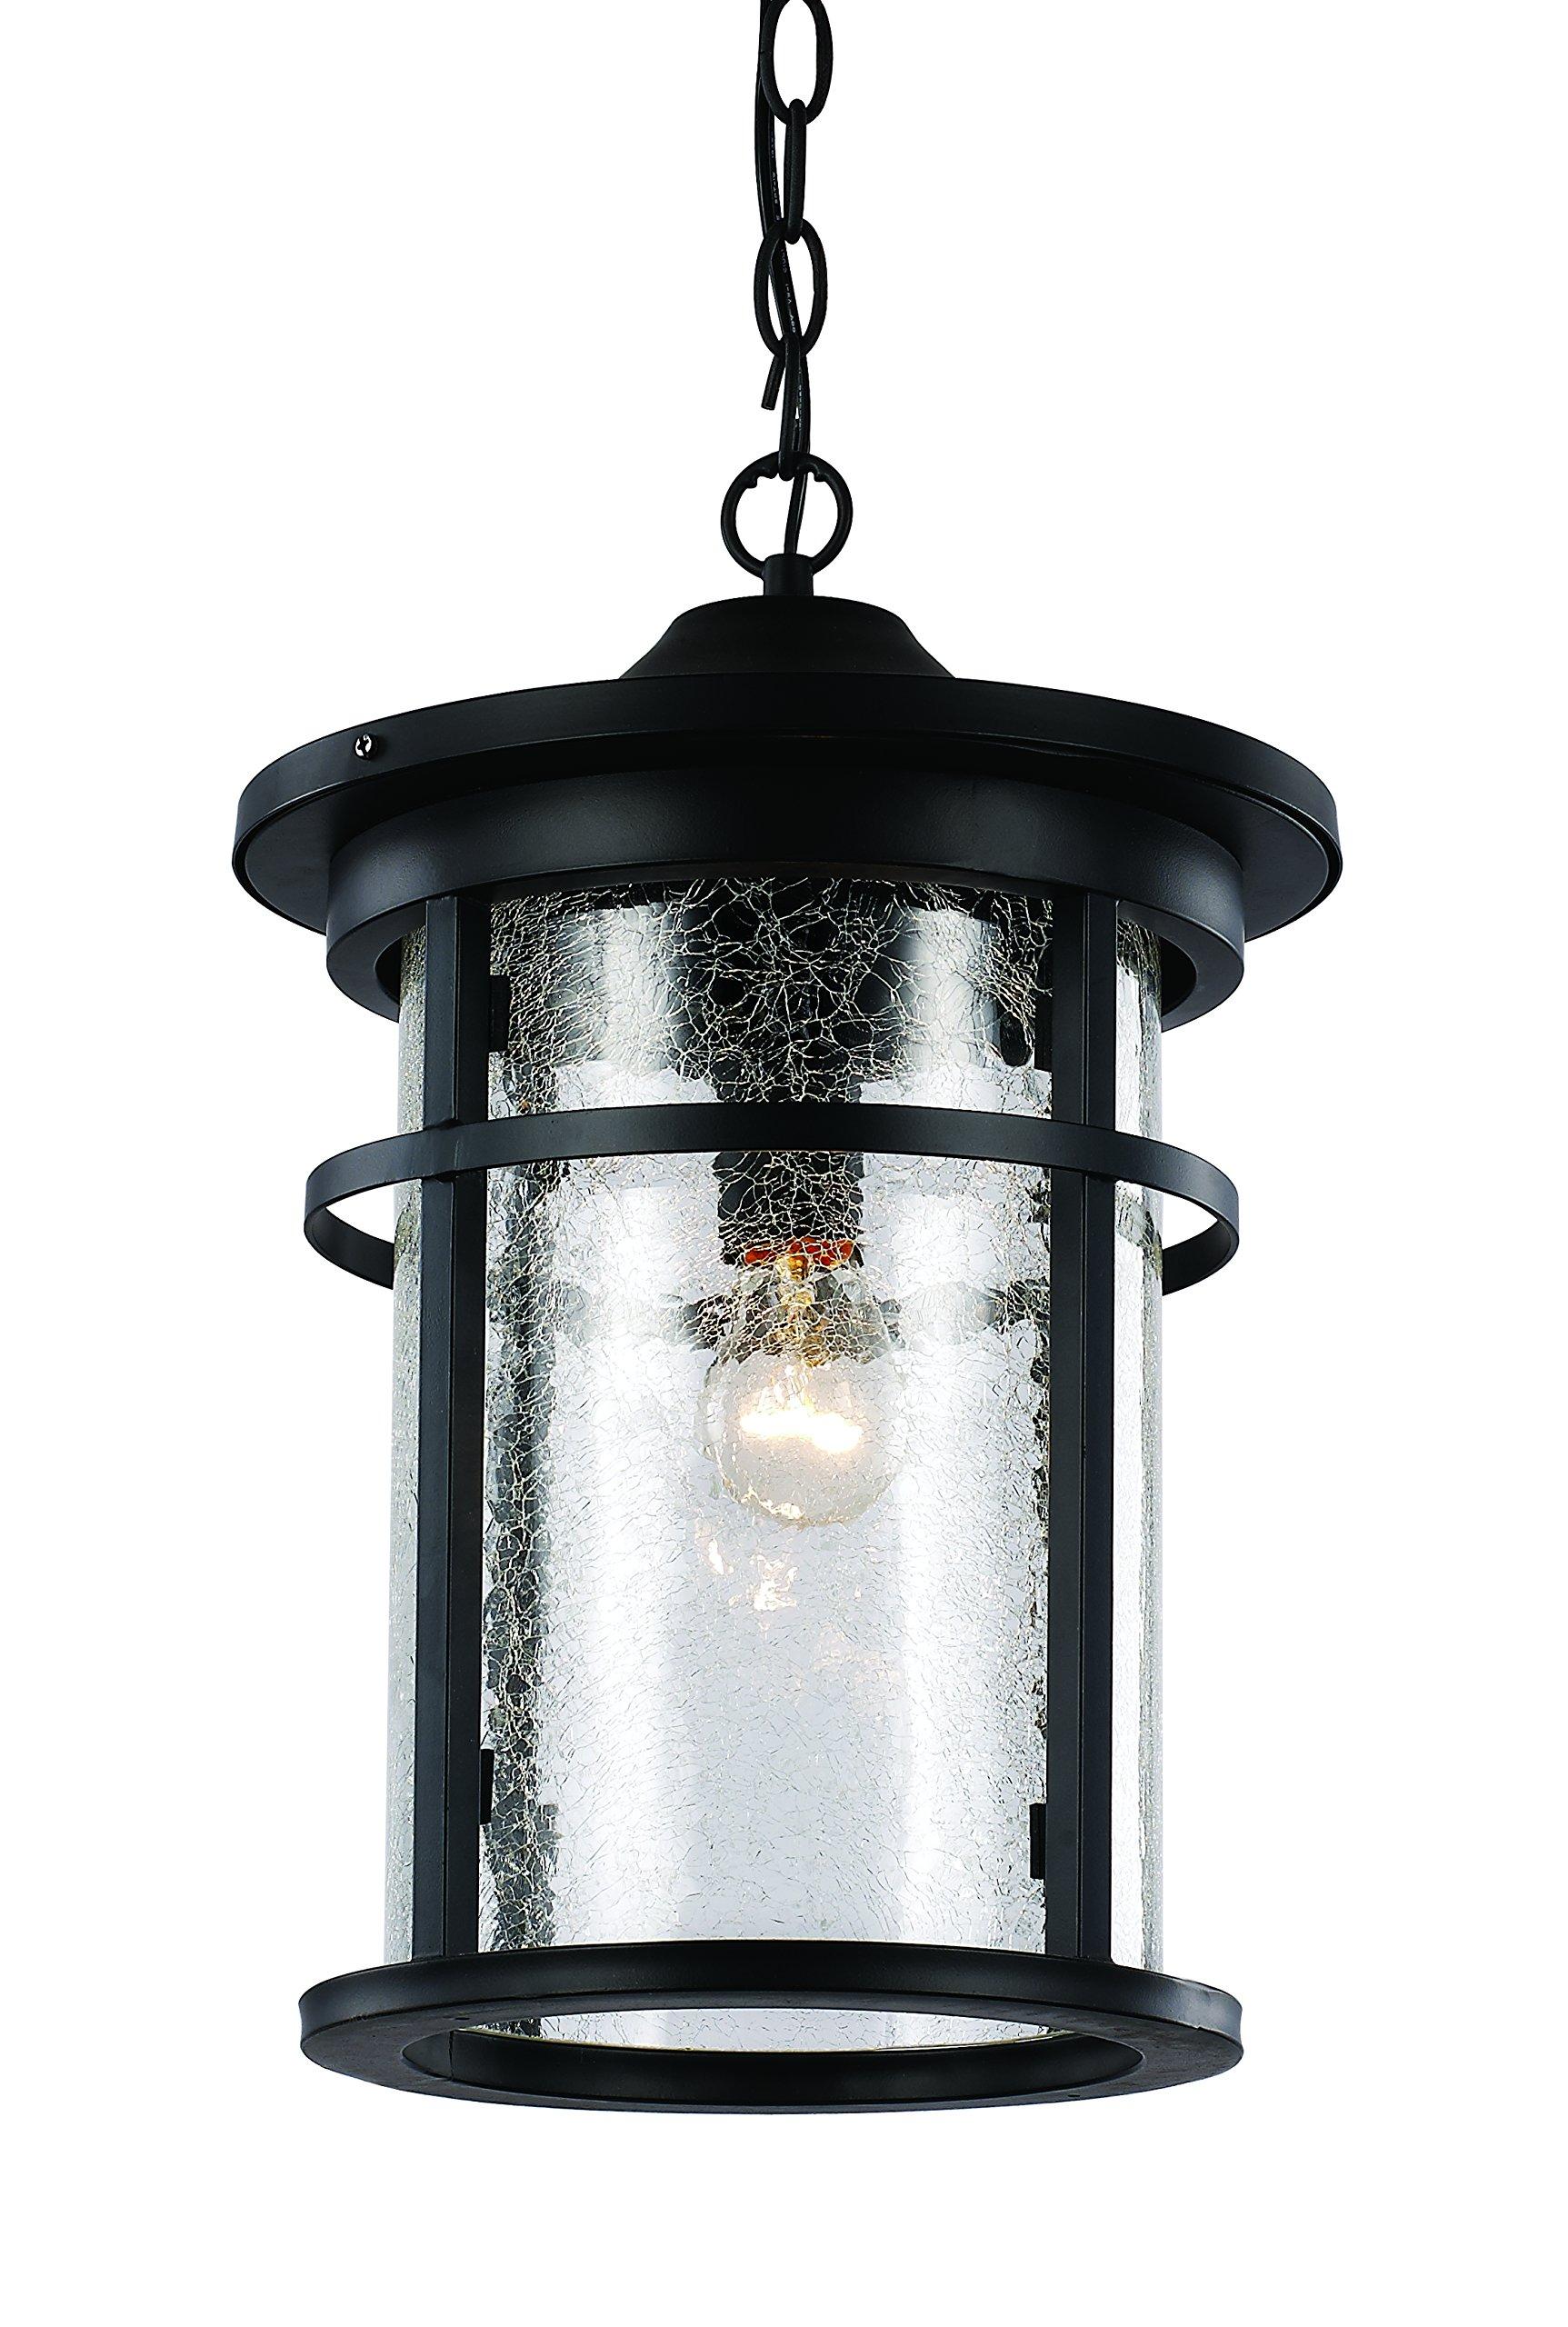 Trans Globe Lighting 40385 BK Outdoor Avalon 13.75'' Hanging Lantern, Black by Trans Globe Lighting